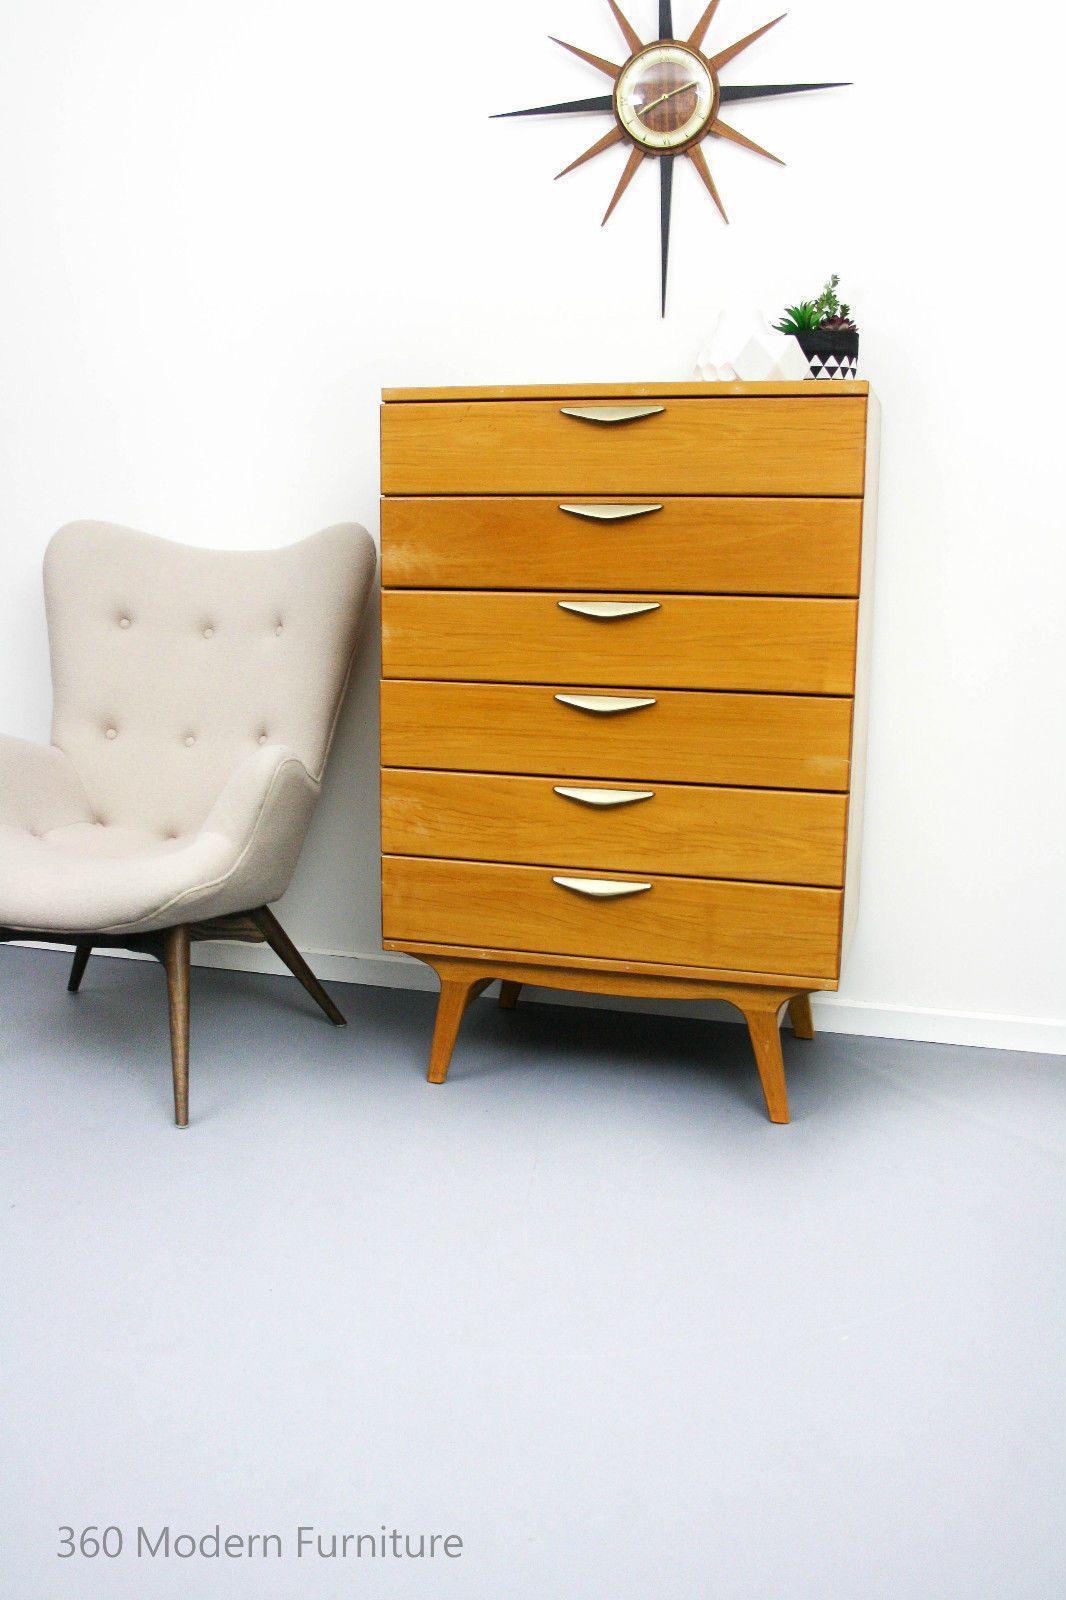 Mid Century Eastgate Industrial Sideboard Drawers Tallboy Retro Vintage Danish Scandi era | 360 Modern Furniture